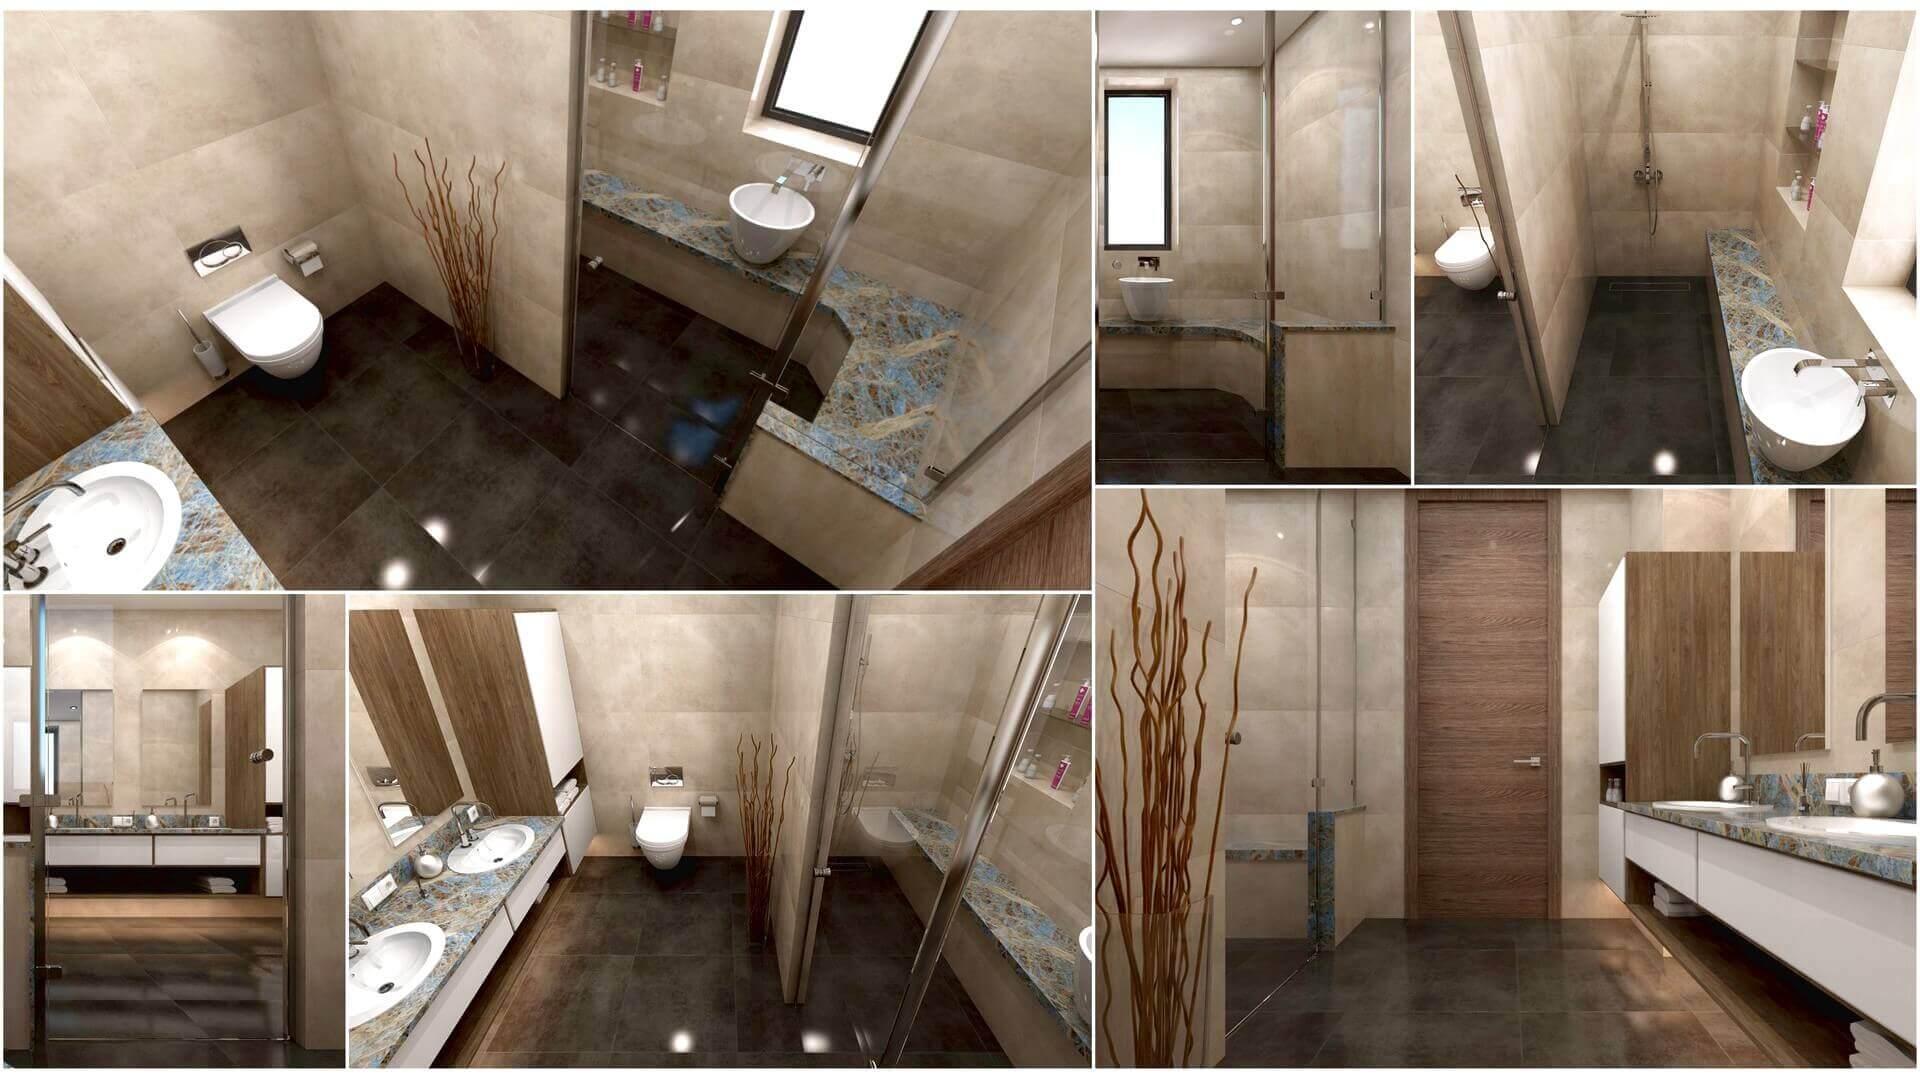 House interior architecture 3001 E. Uslu Konutu Residential